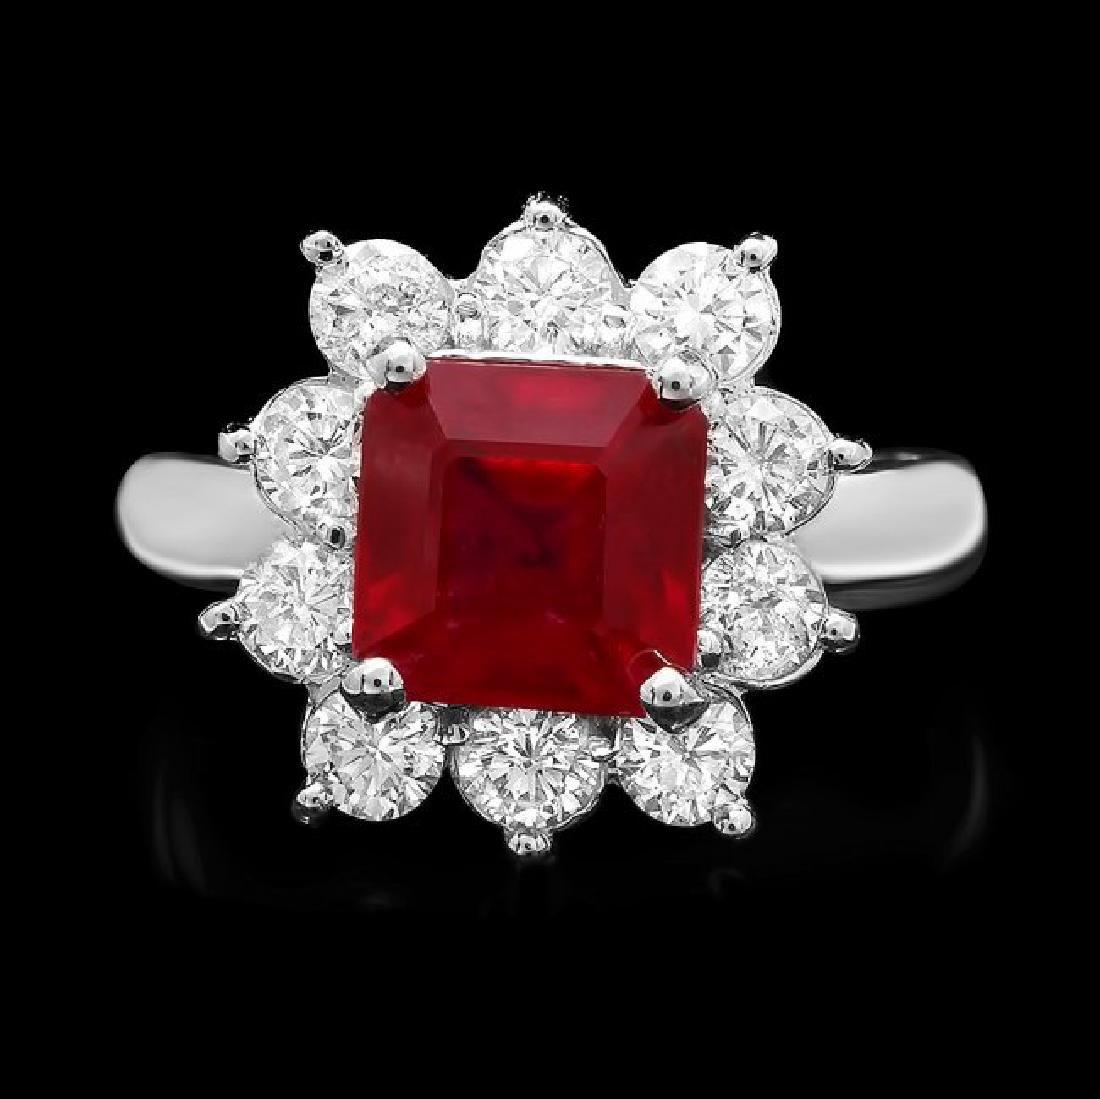 14k White Gold 3.40ct Ruby 1.25ct Diamond Ring